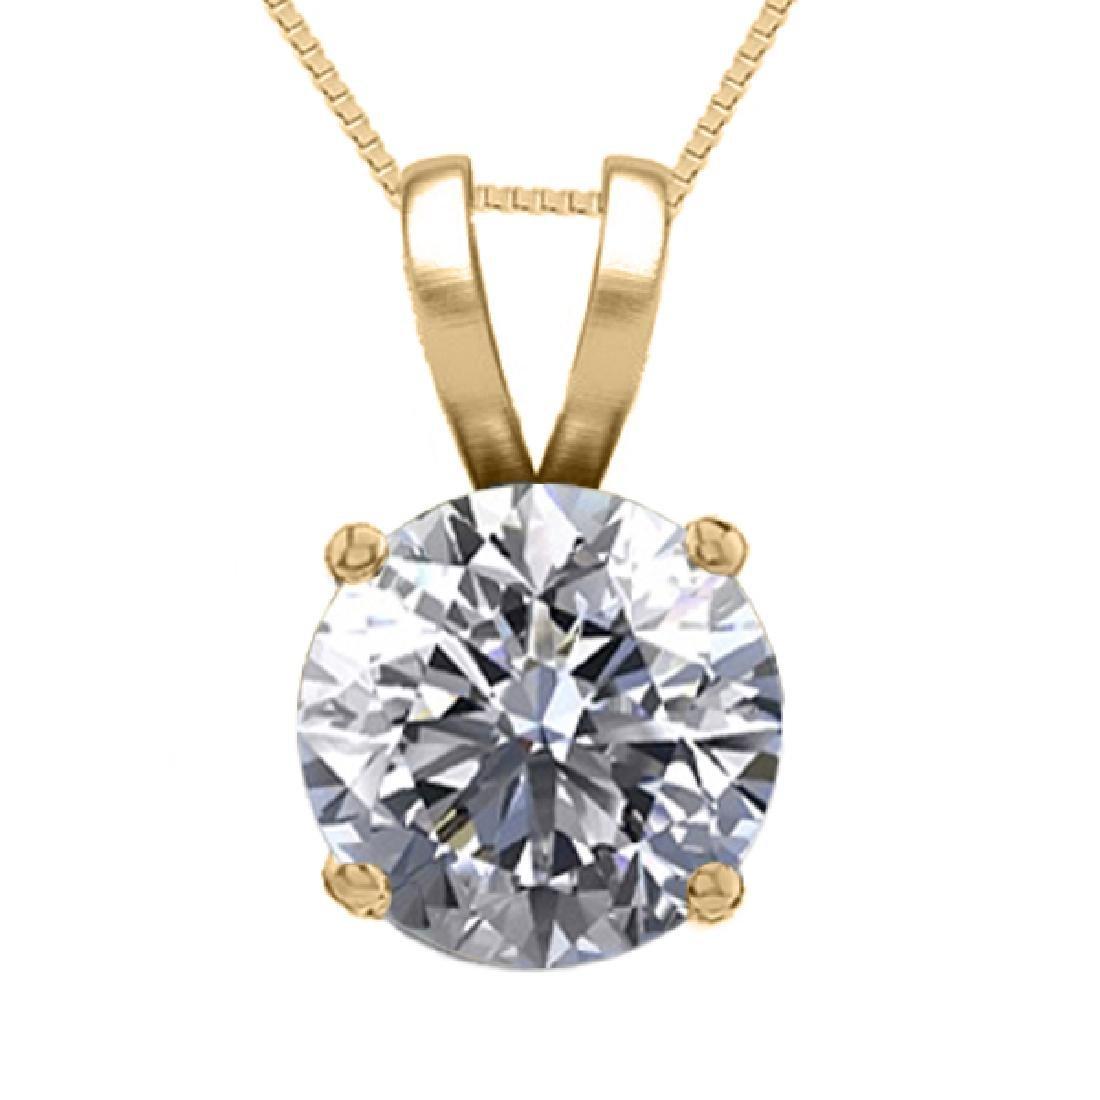 14K Yellow Gold Jewelry 1.01 ct Natural Diamond